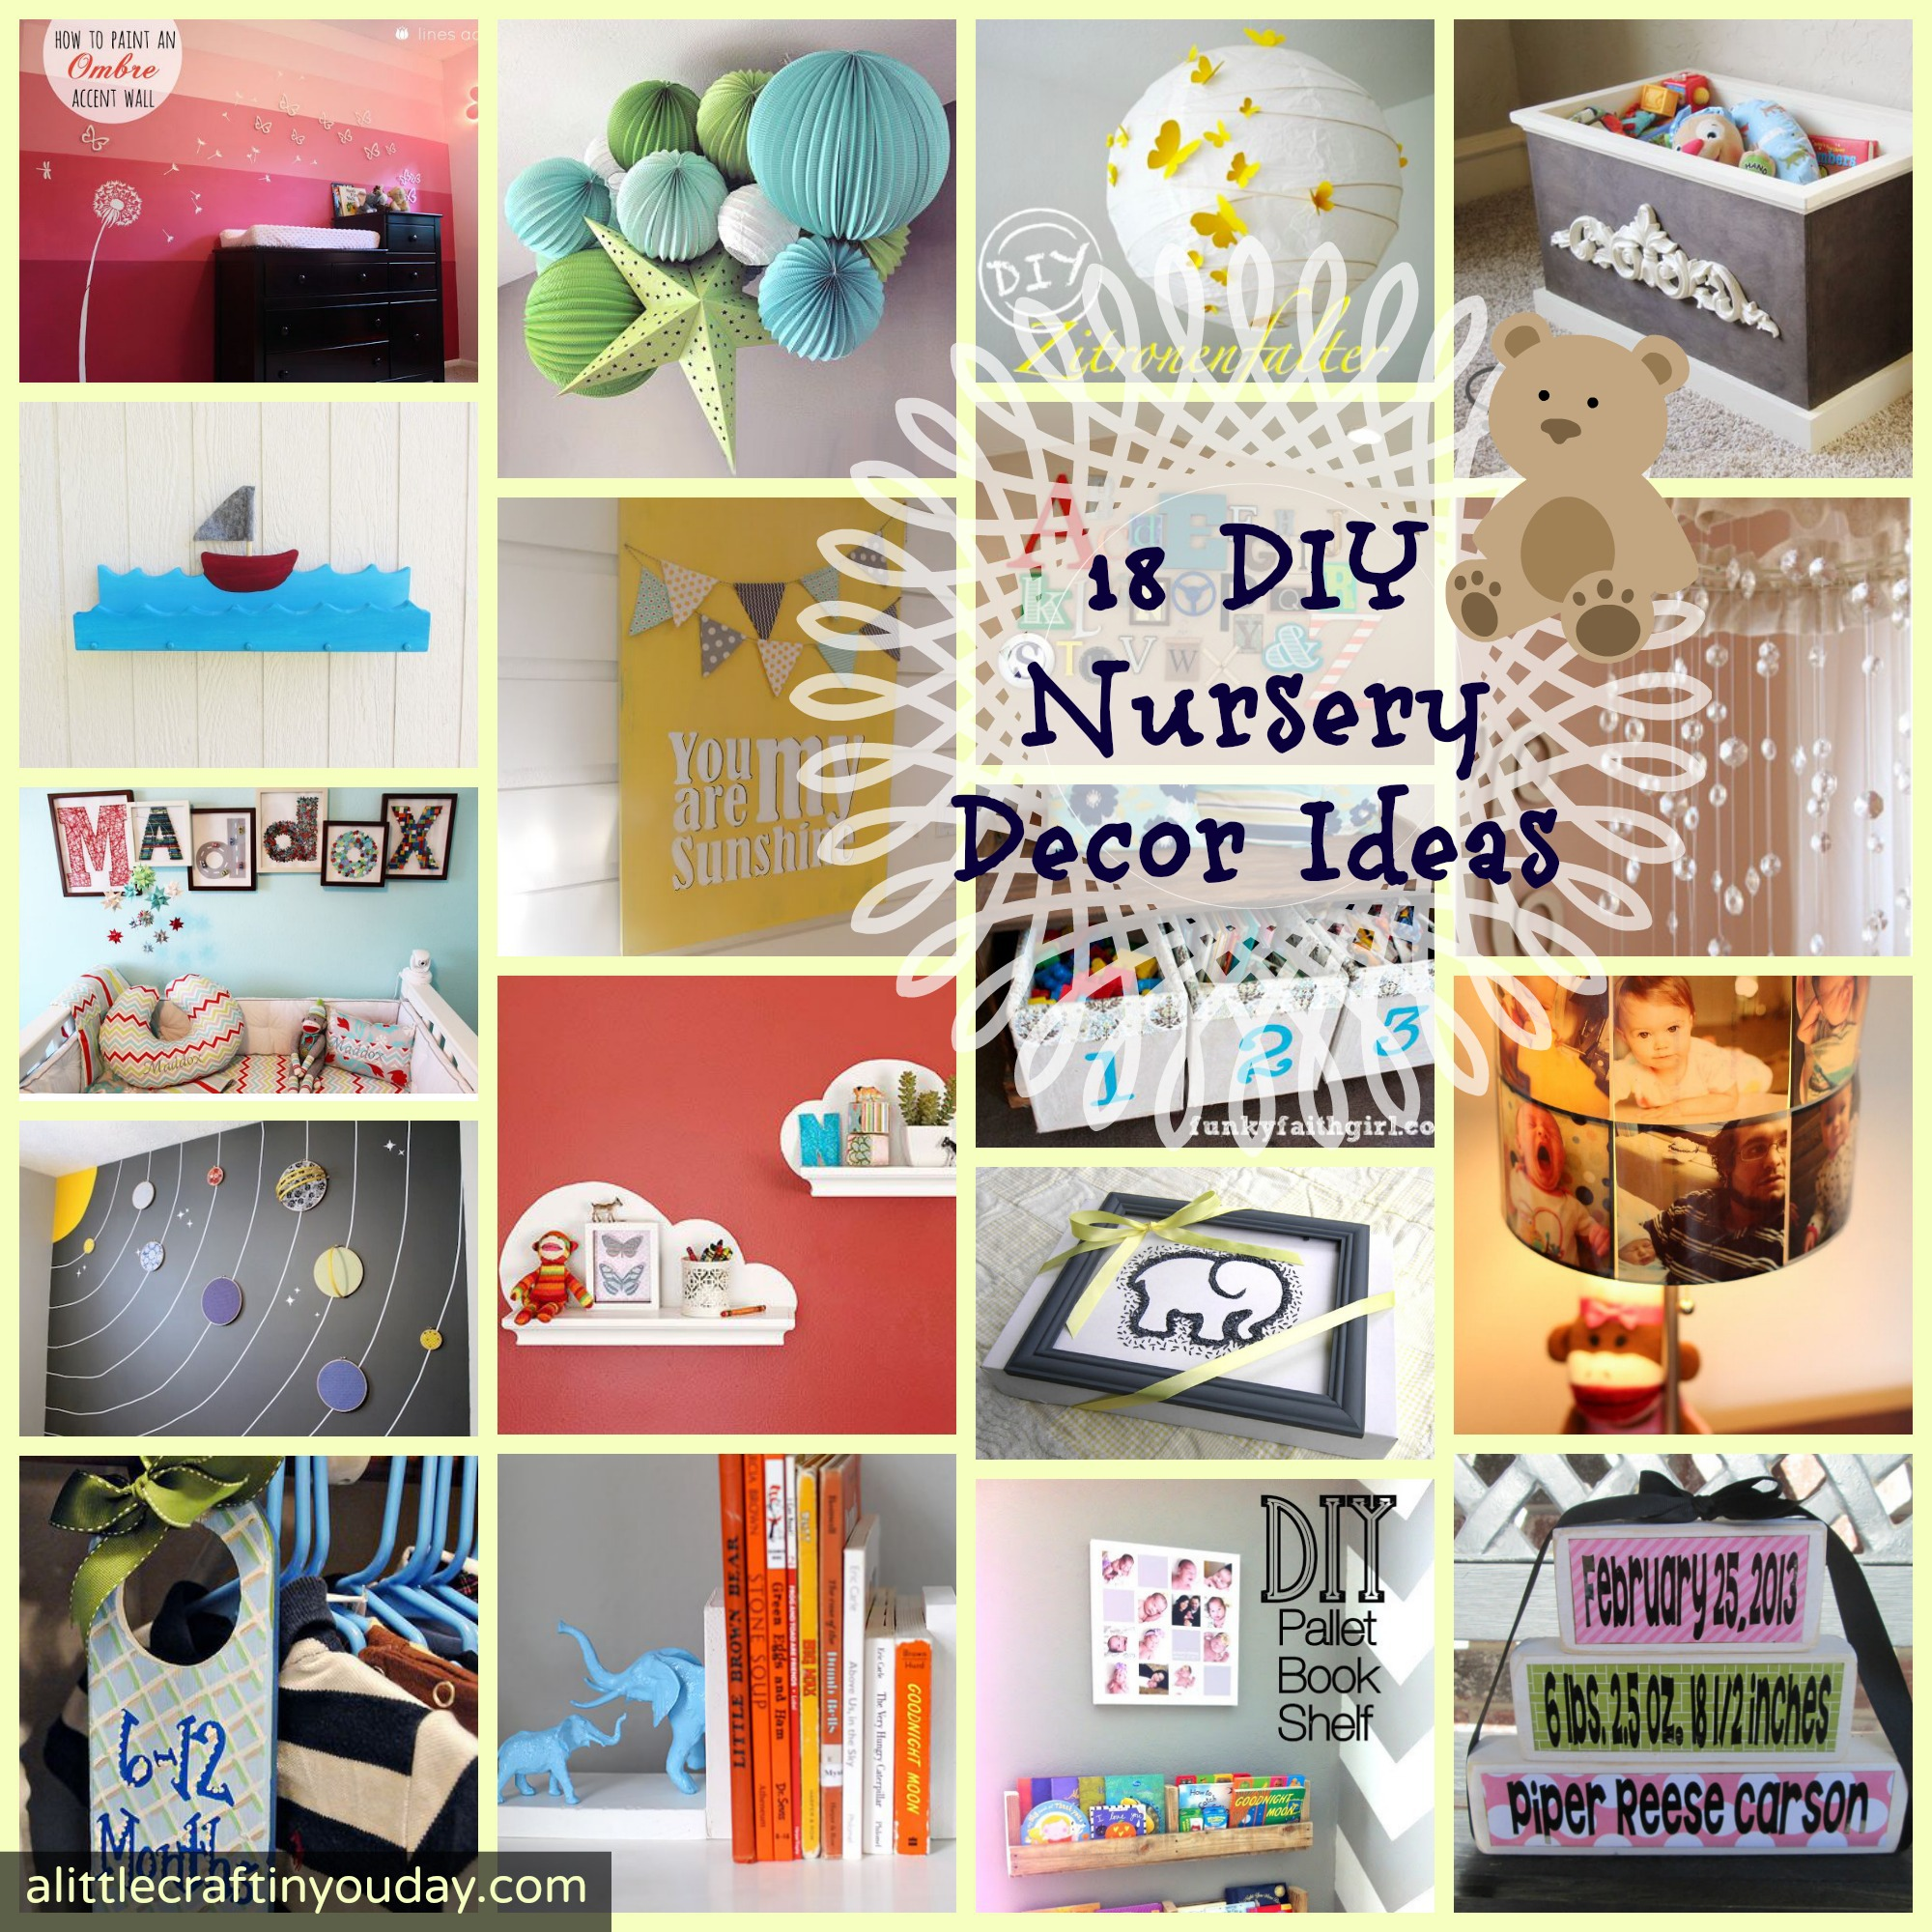 18 Diy Nursery Decor Ideas A Little Craft In Your Day